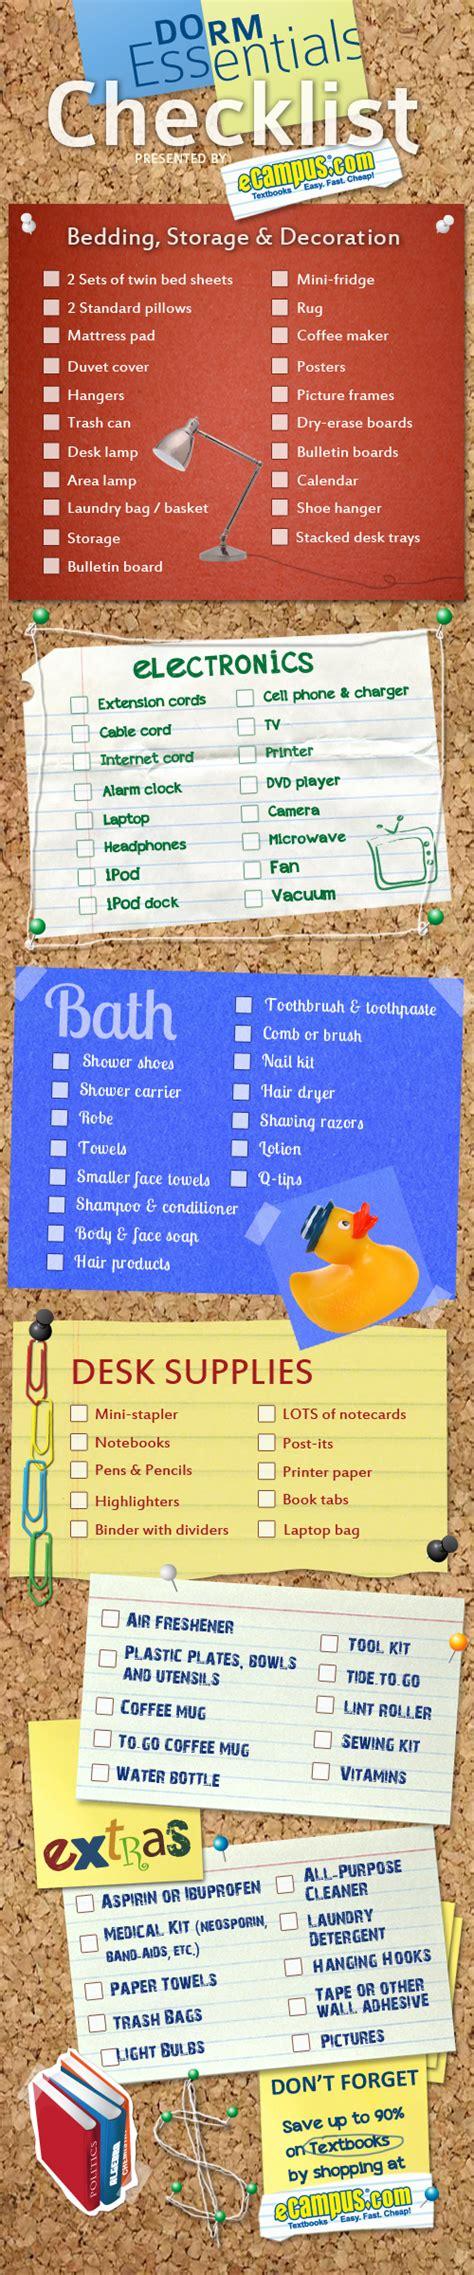 room essentials list list of 10 room essentials checklist